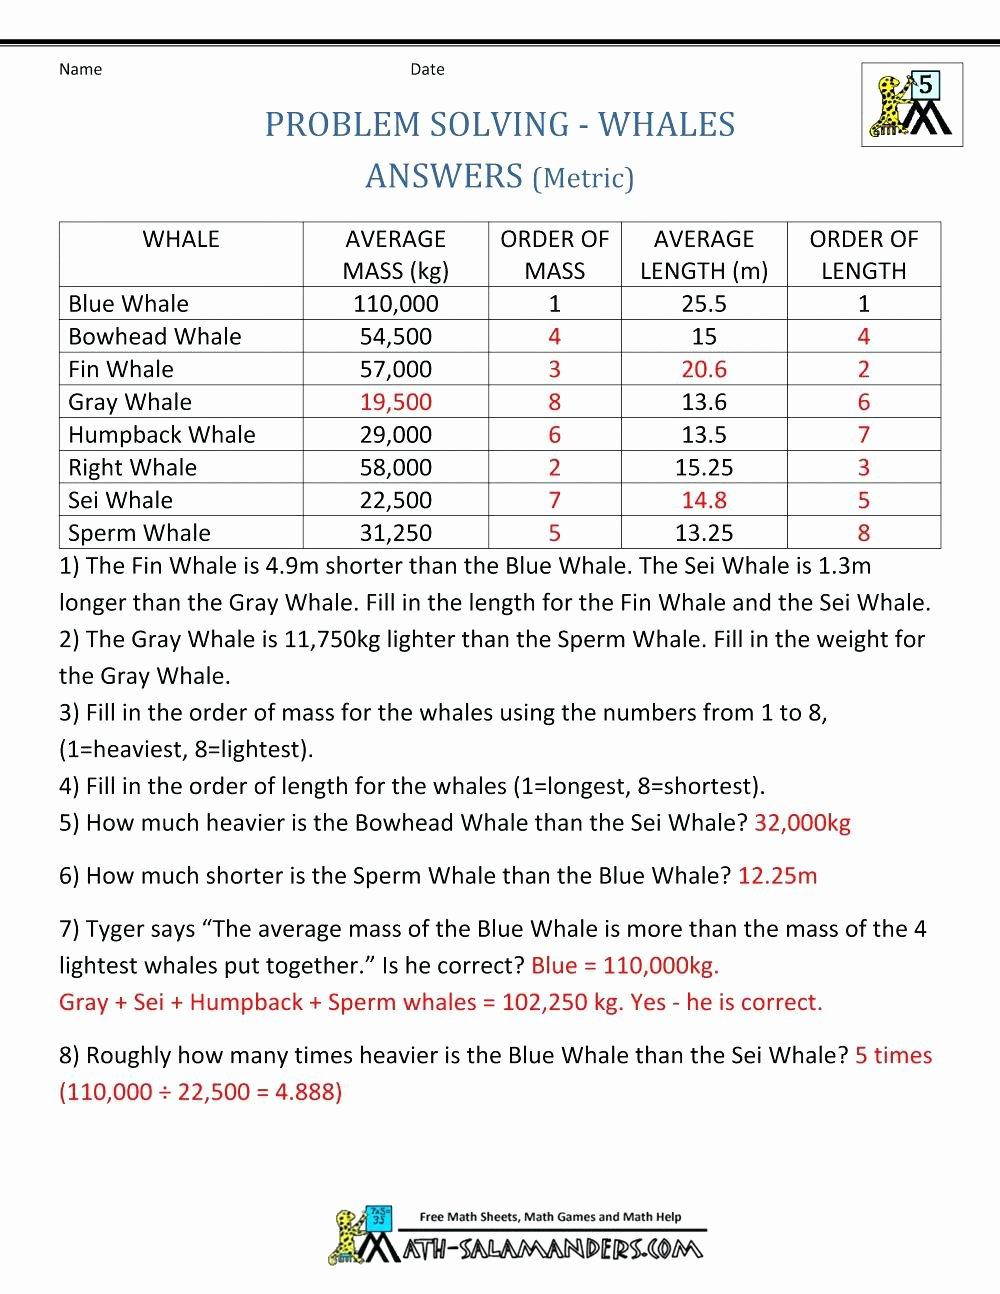 Measuring Units Worksheet Answer Key Elegant Metric Units Measurement Worksheet